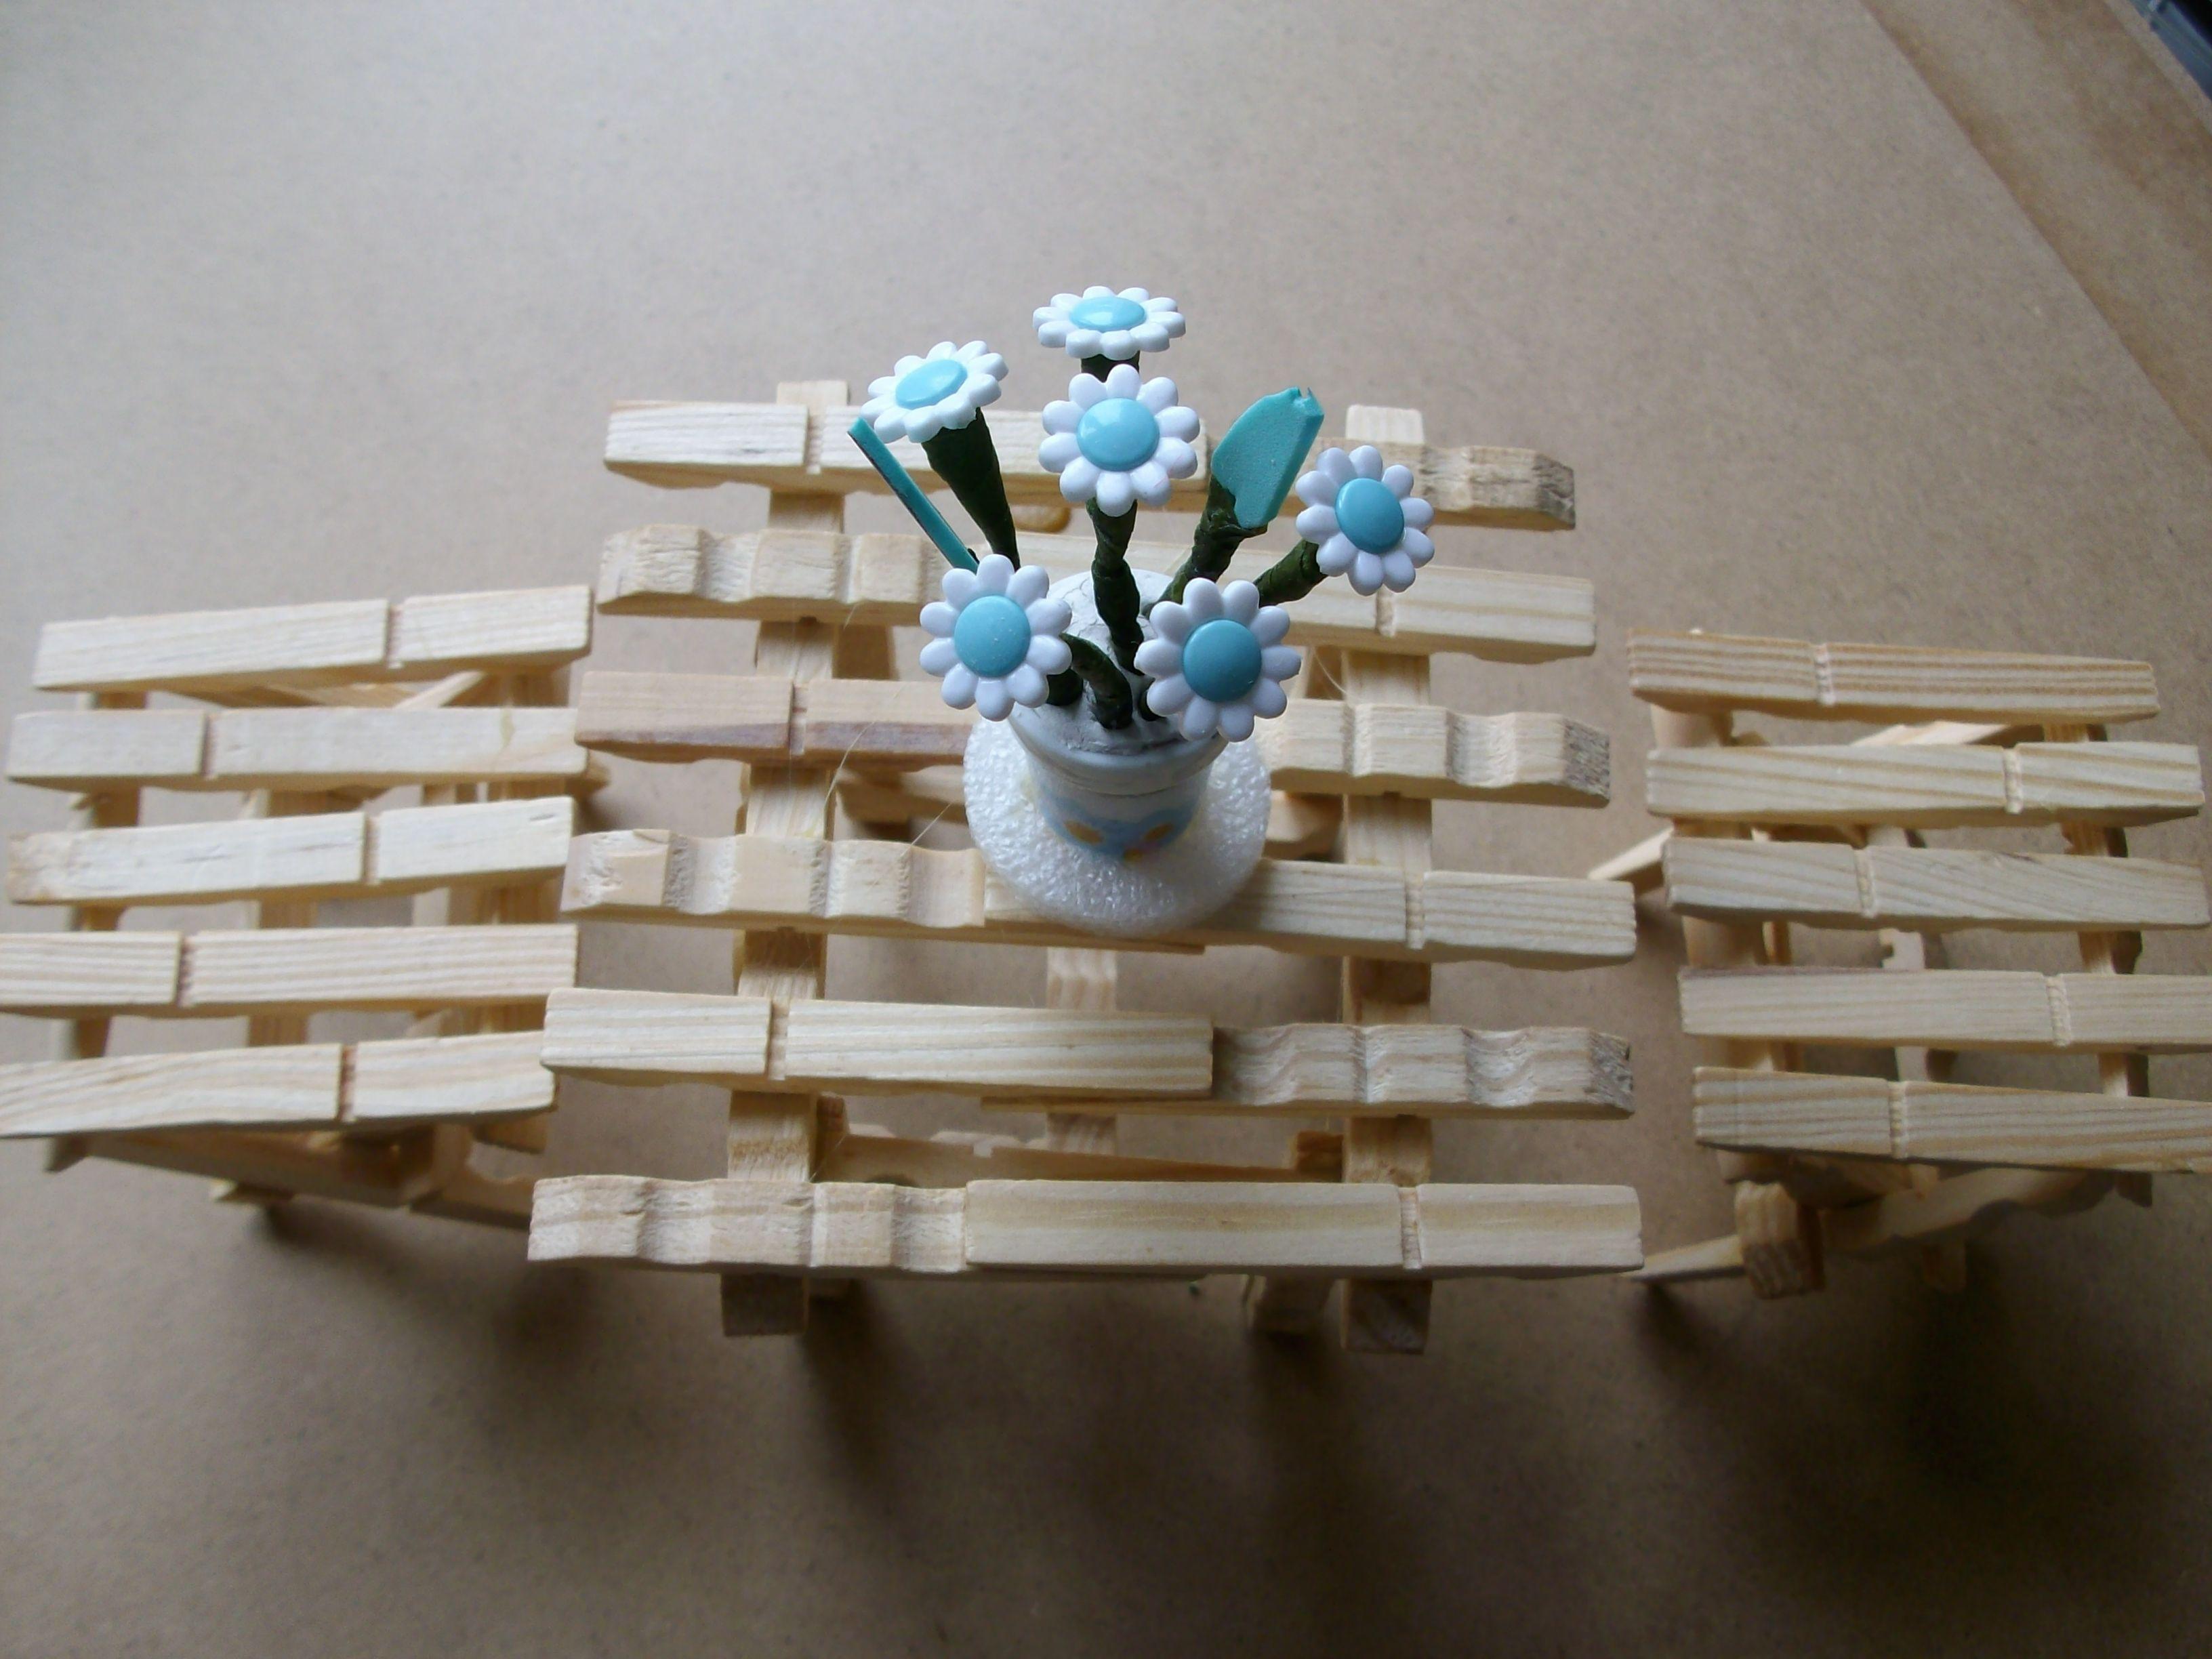 pingle linge pingle linge pinterest quilling and craft. Black Bedroom Furniture Sets. Home Design Ideas